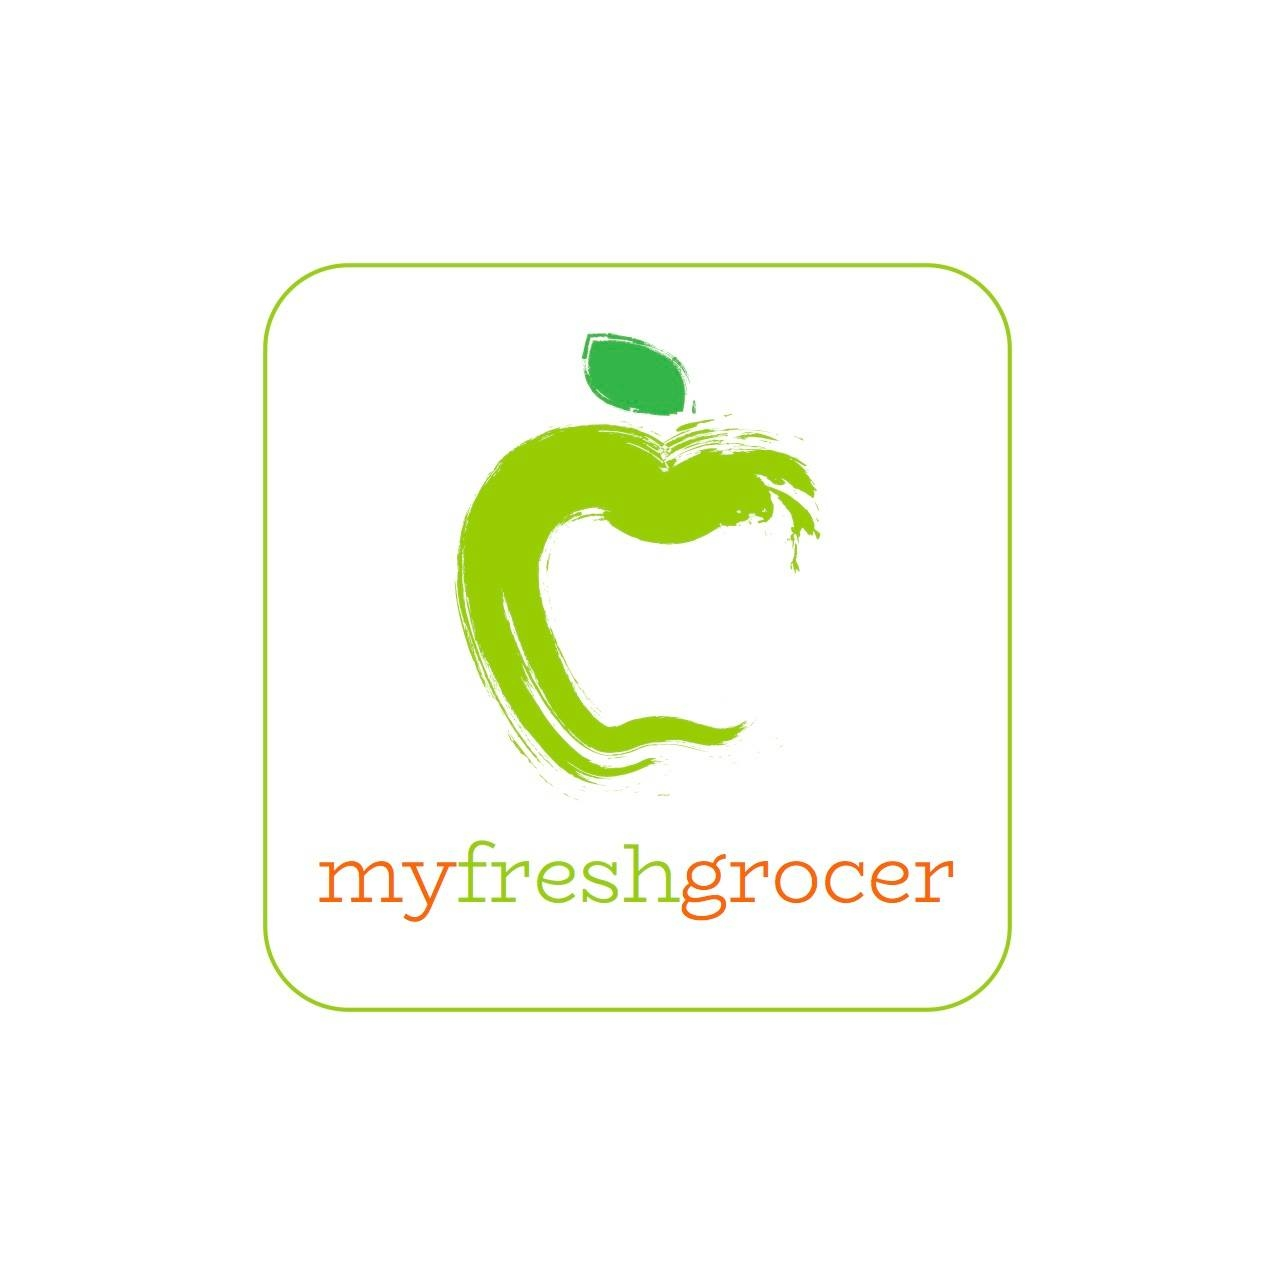 My Fresh Grocer